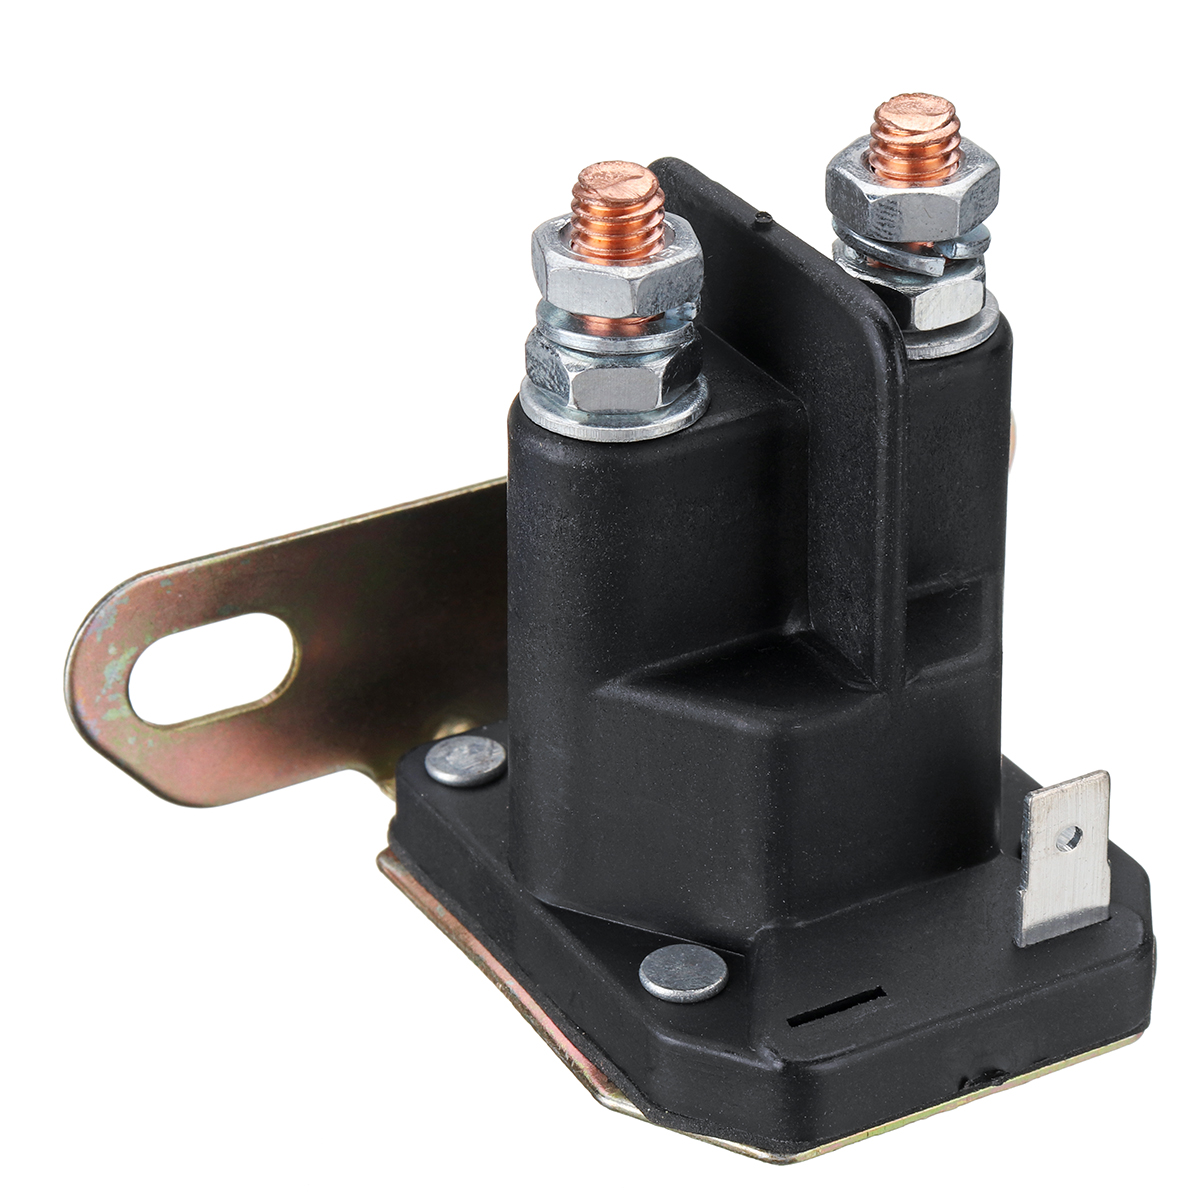 12V соленоидный реле для Trombetta 812-1211-211 9326519 932651WR 93265WR - фото 3